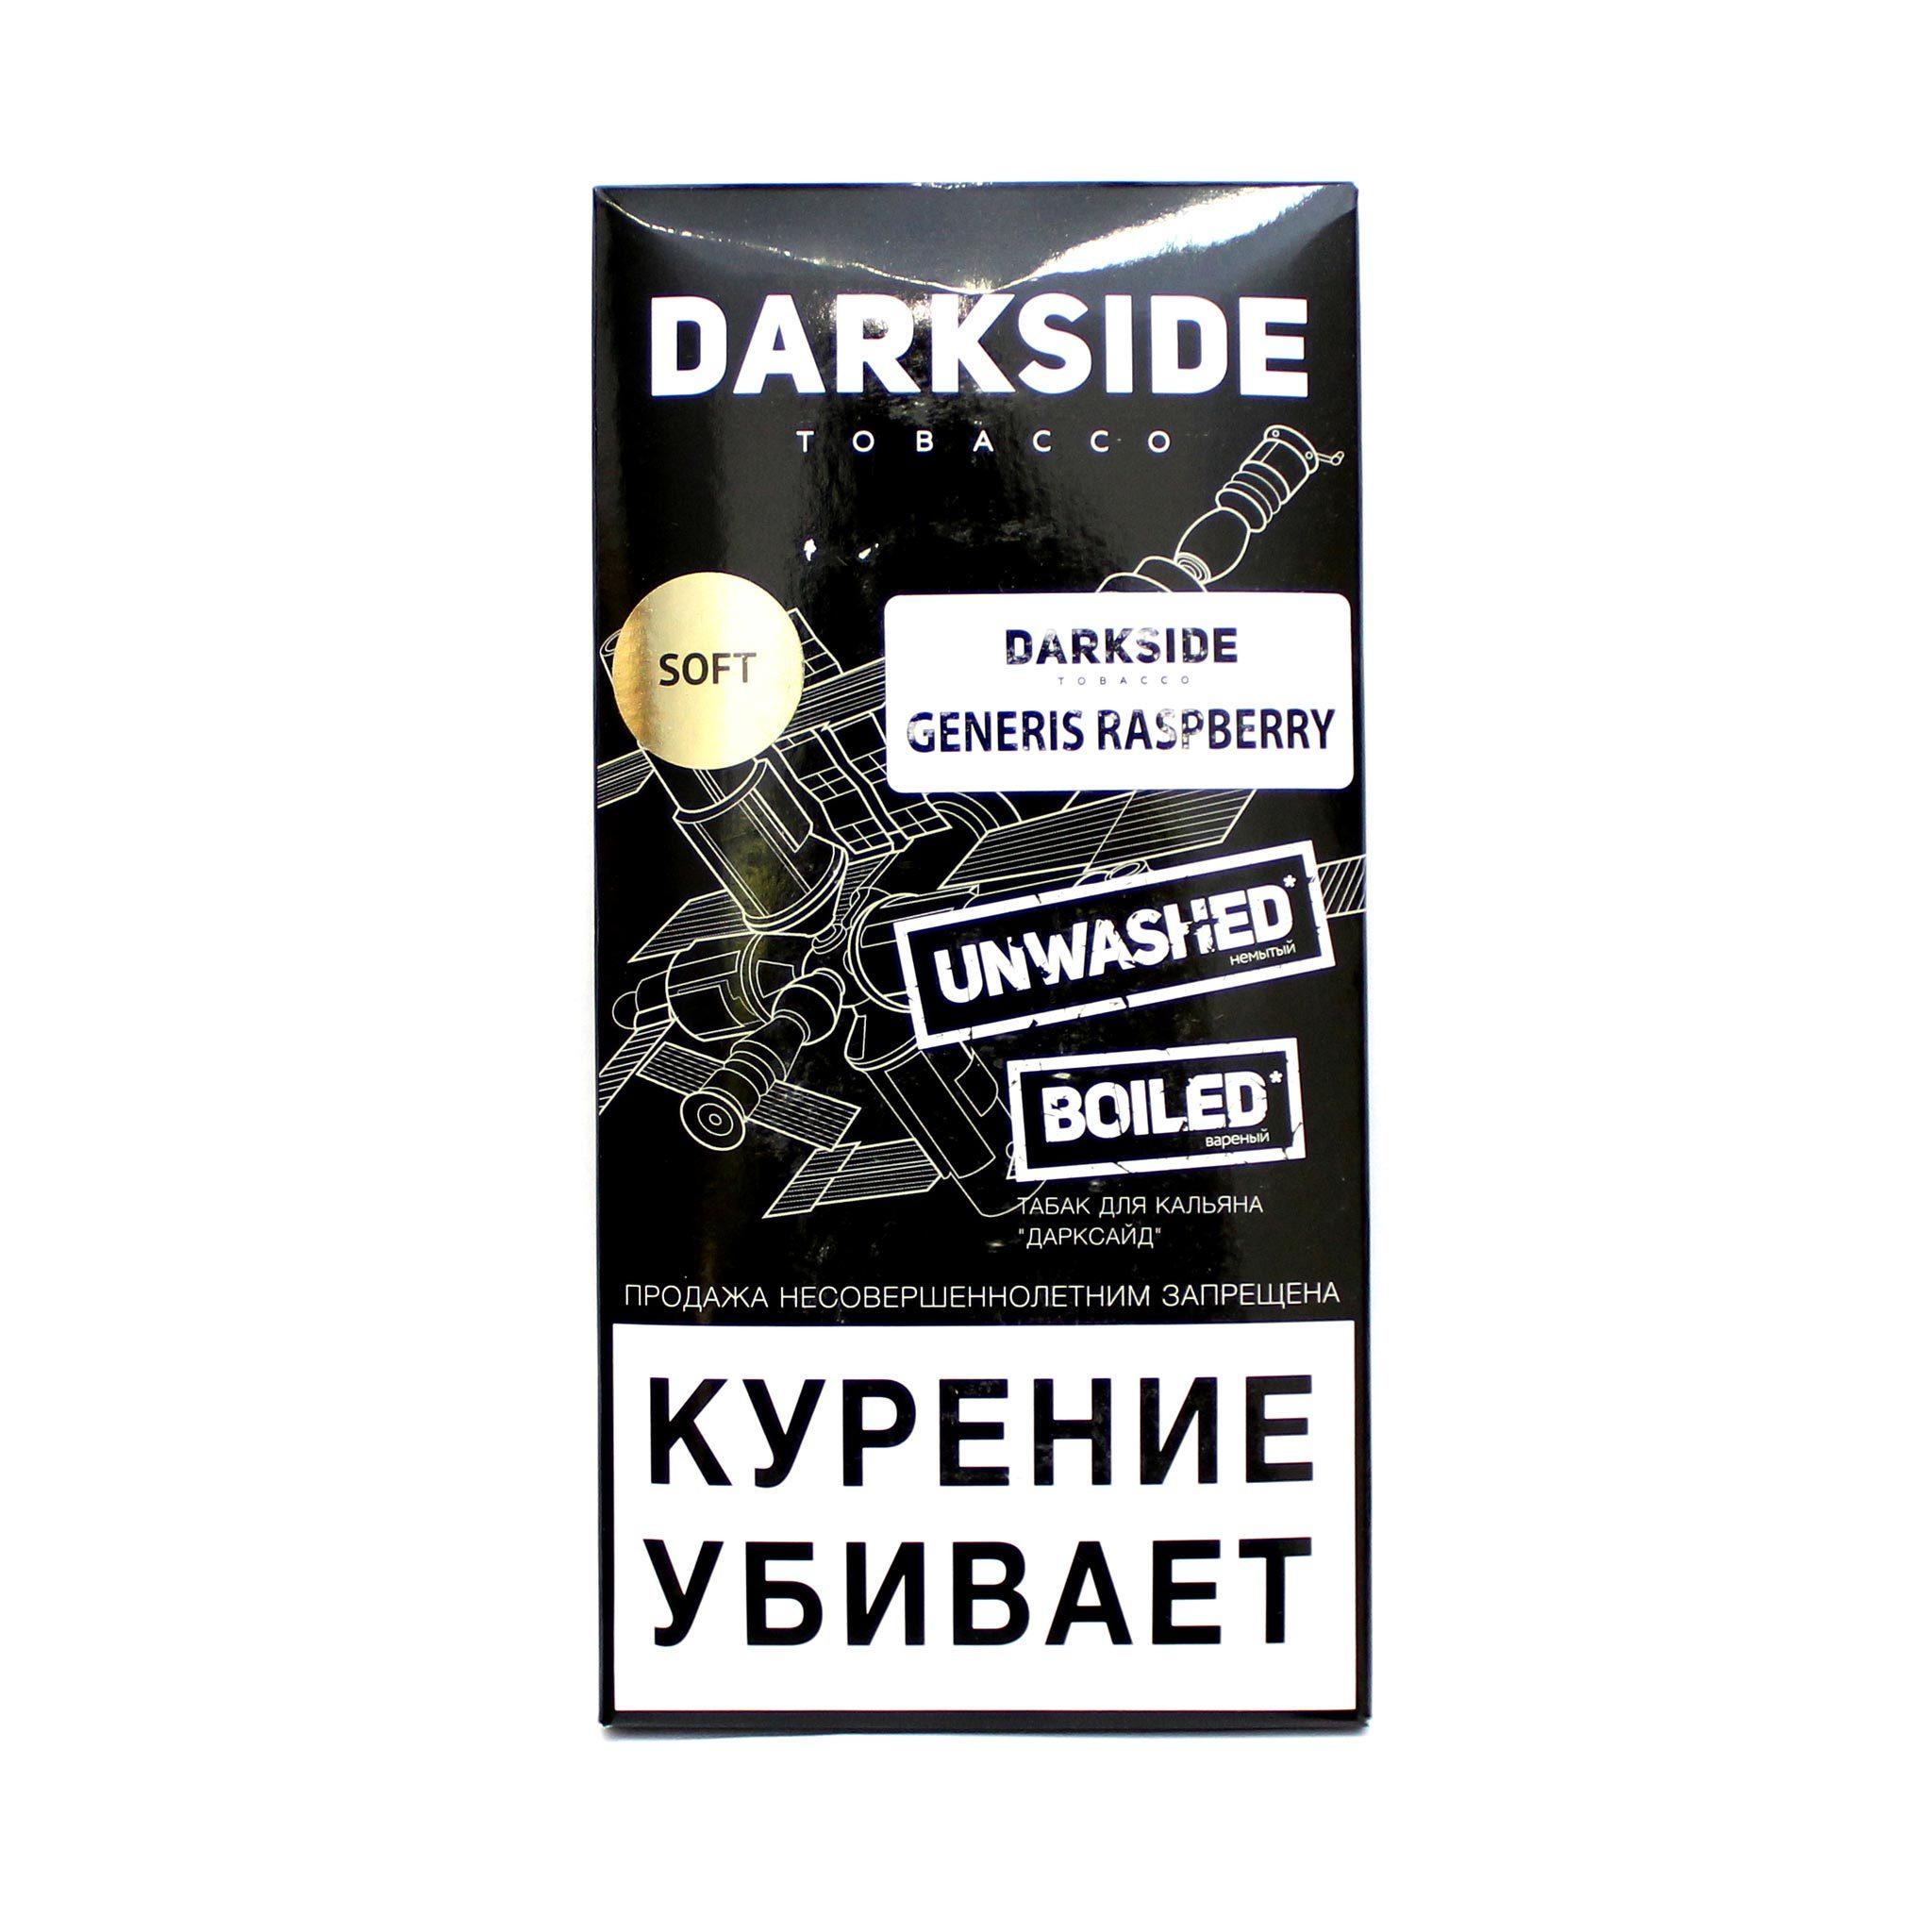 Табак для кальяна Dark Side Soft 250 гр. Generis Raspberry